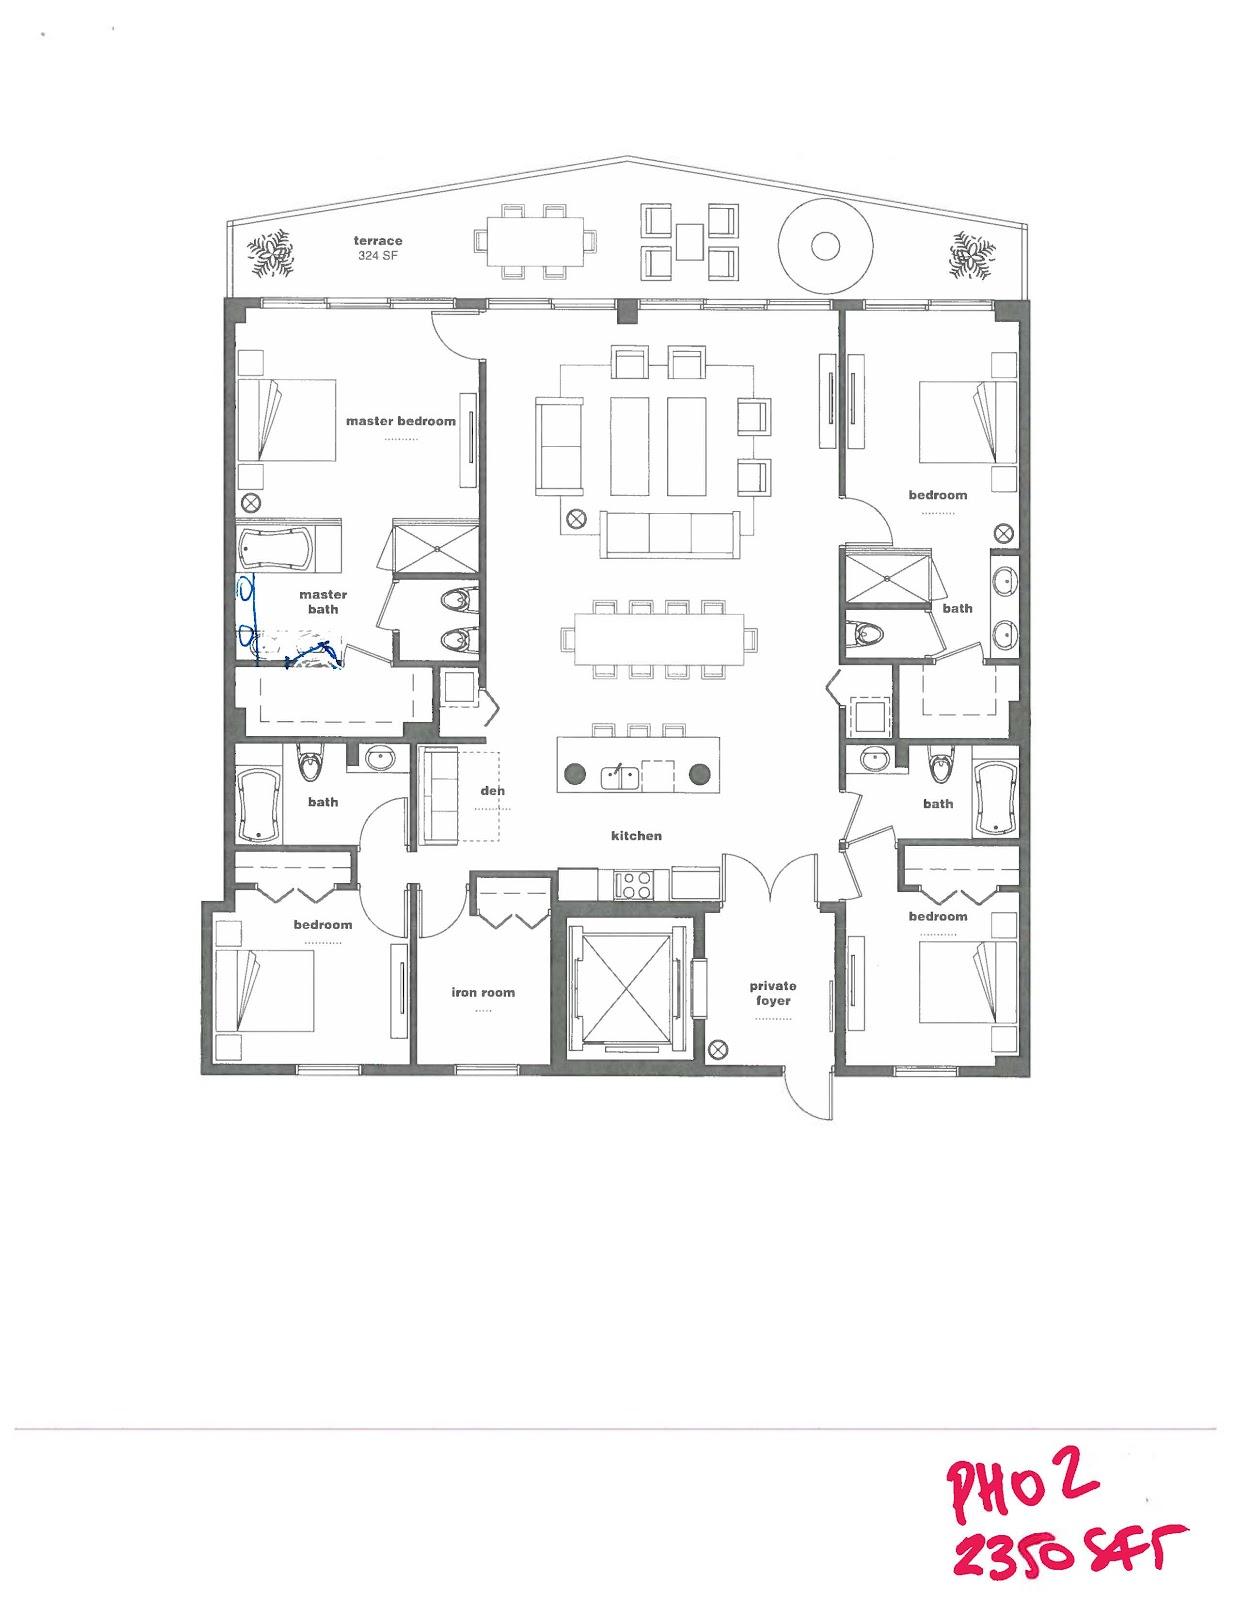 Miami riches real estate blog icon bay preliminary for Bay house plans